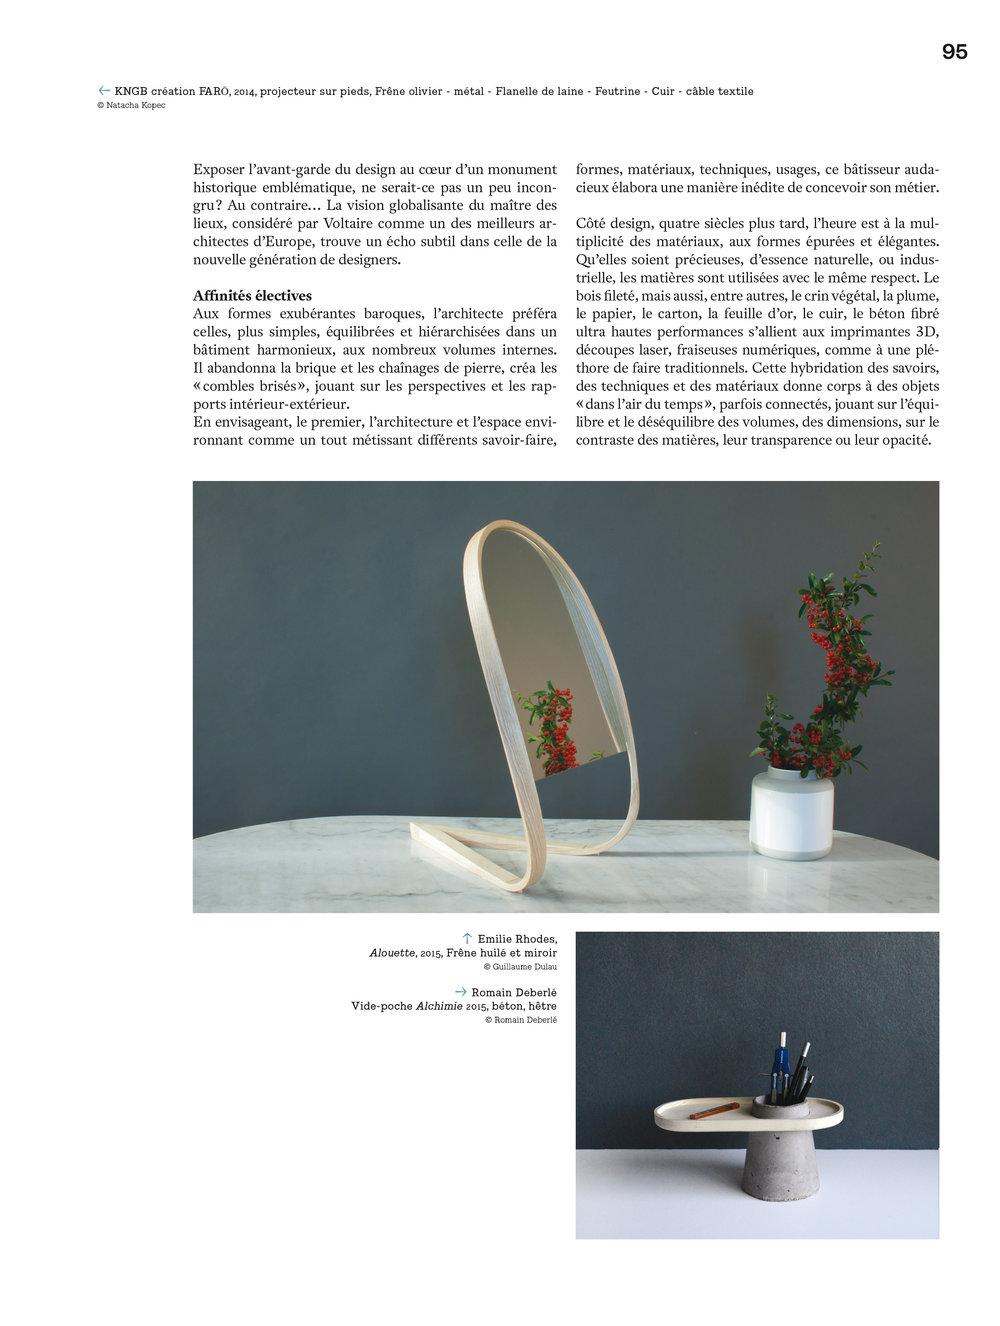 2016-septembre-parution-papier-archistorm-02-inoow-design.jpg